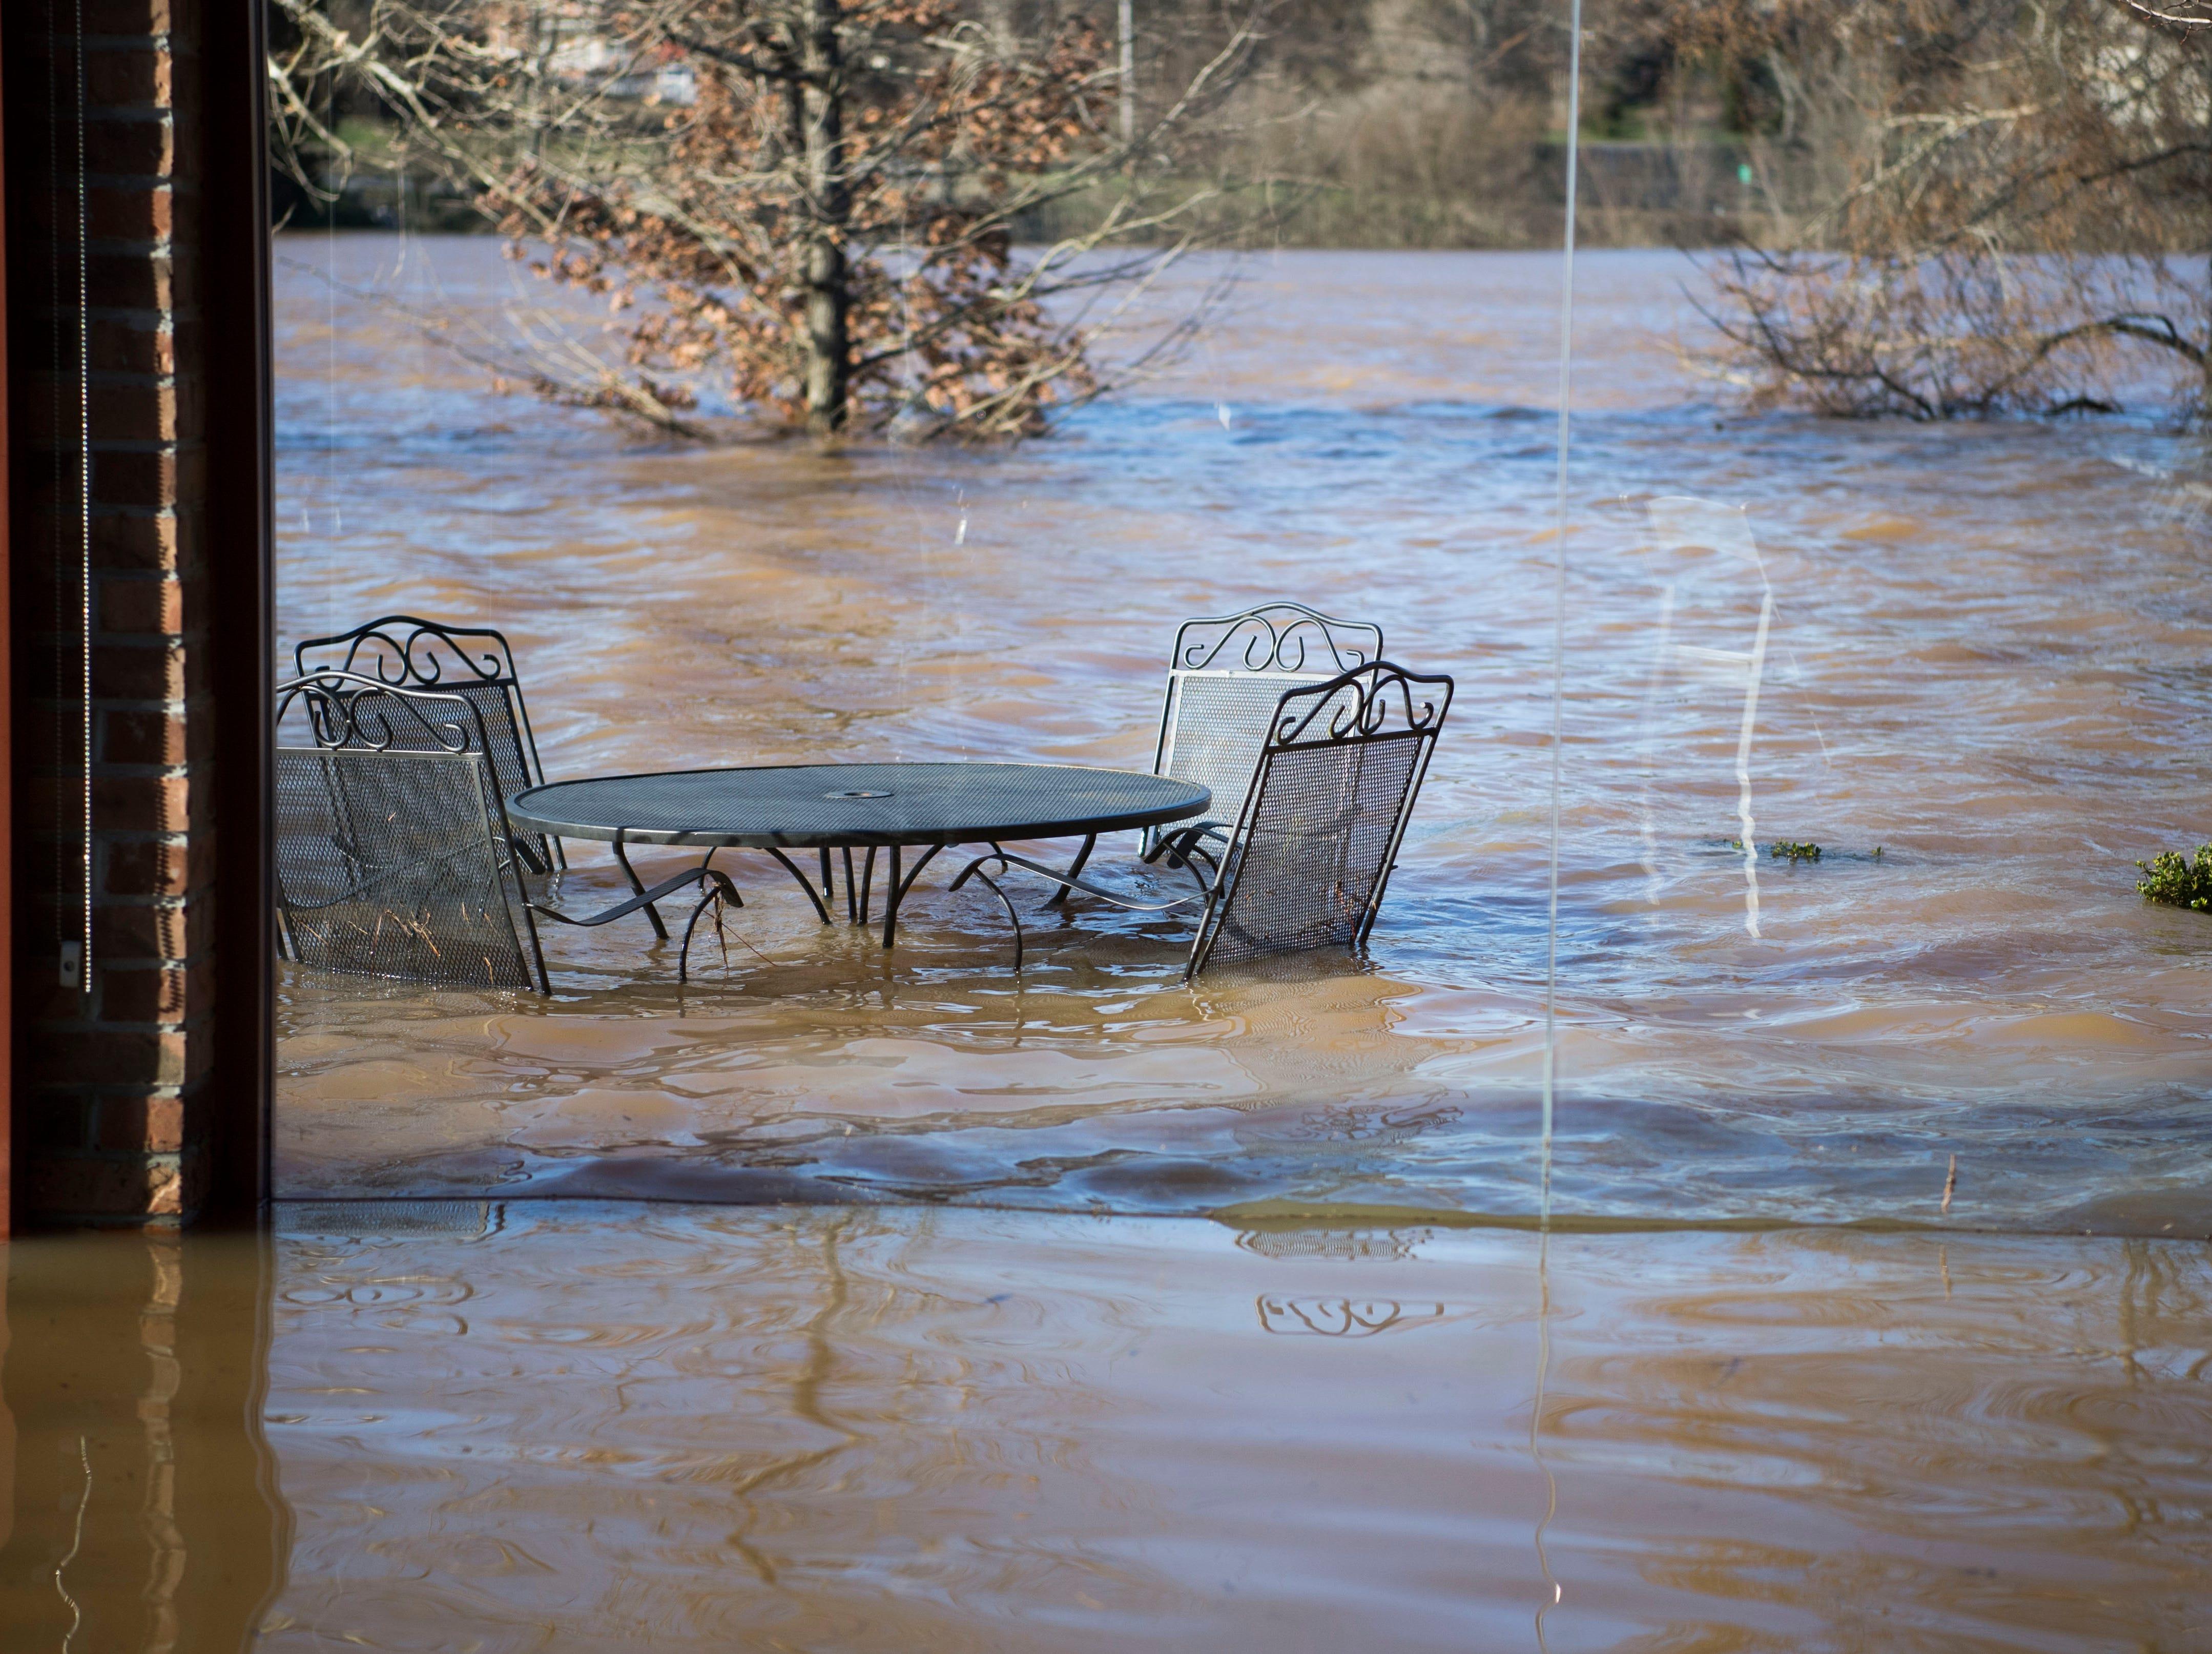 Flood damage is visible at Hunter Valley Farm's pavilion Sunday, Feb. 24, 2019.